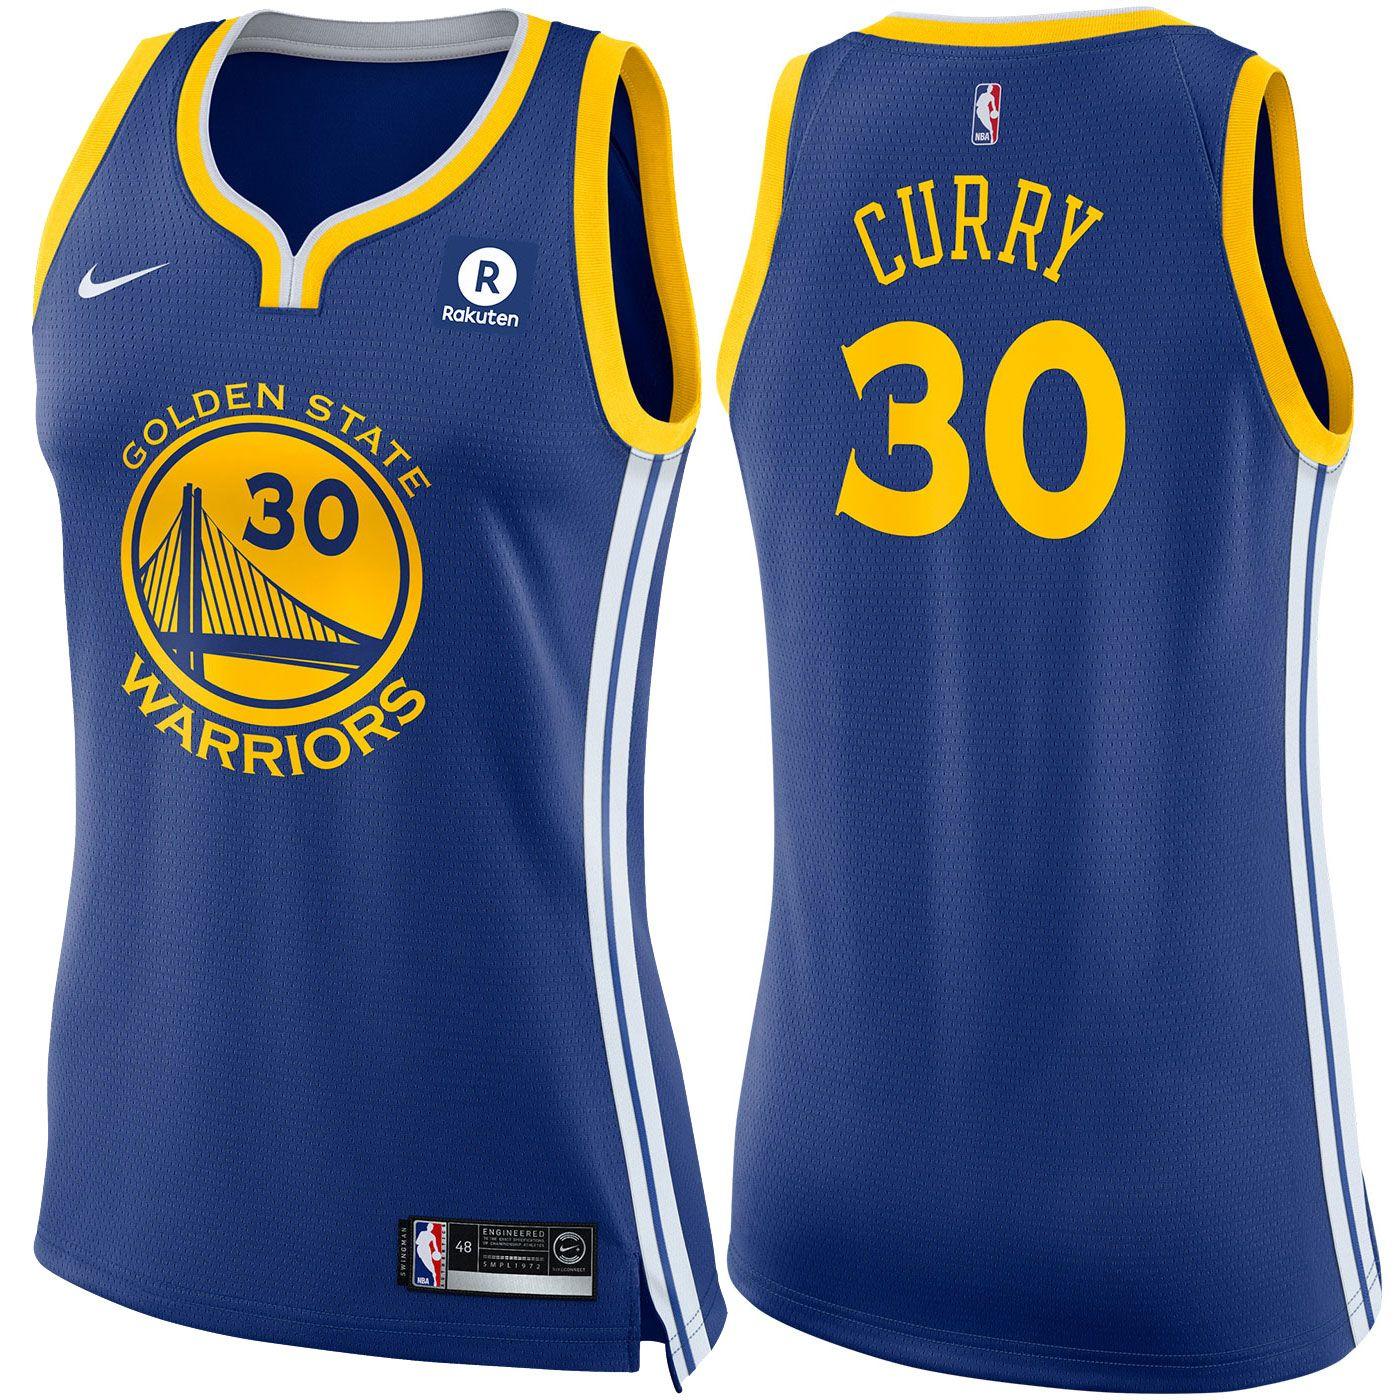 53fb54a0540 Golden State Warriors Nike Dri-FIT Women's Stephen Curry #30 Swingman Icon  Jersey - Royal